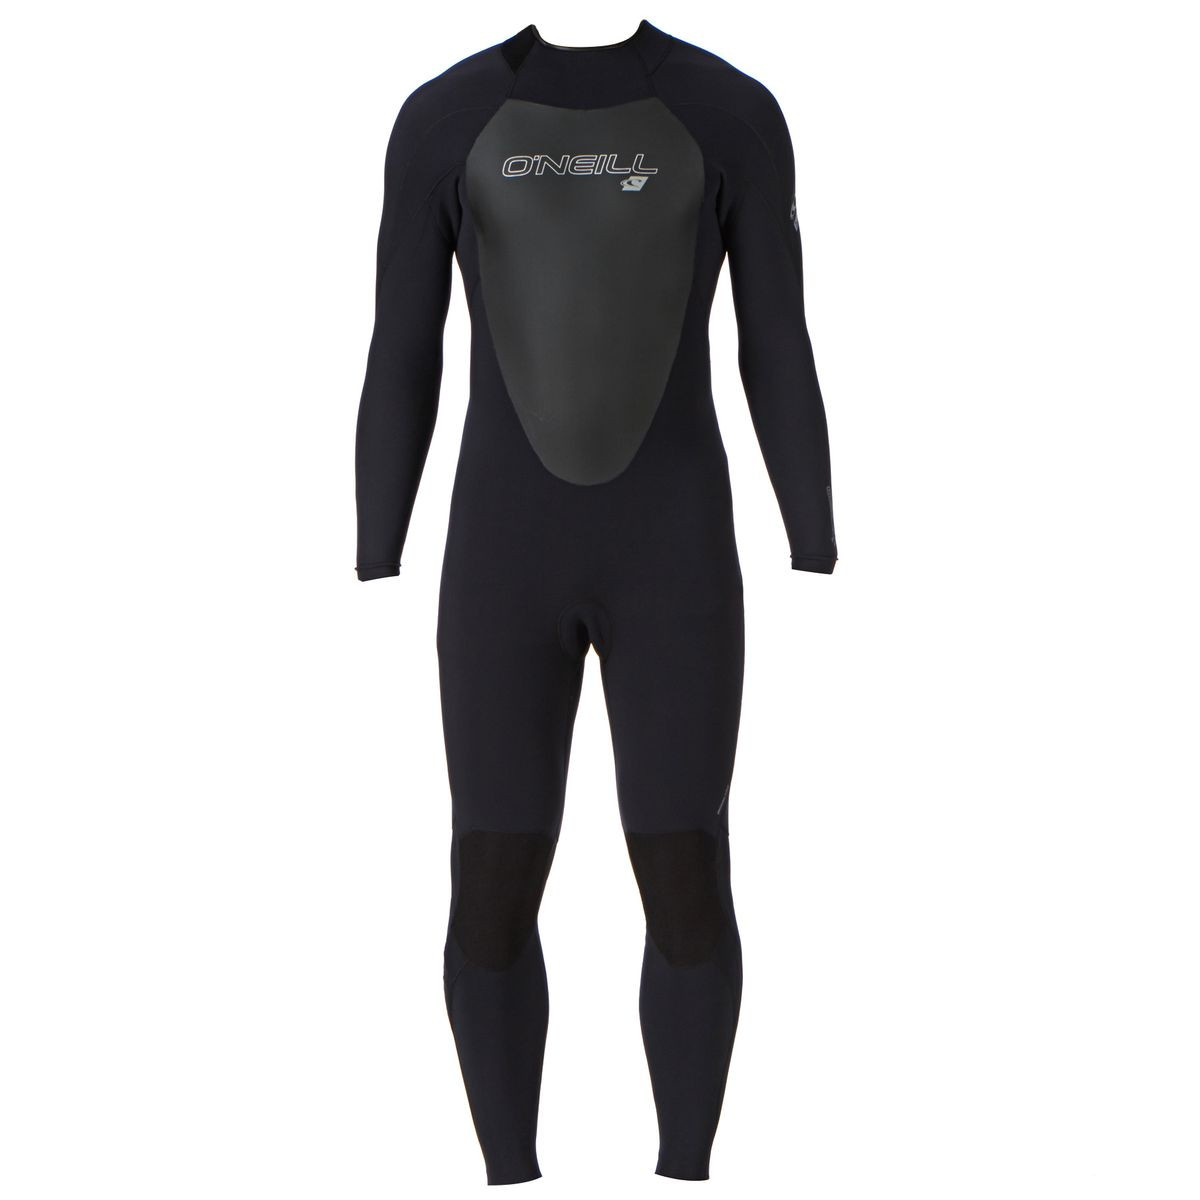 6c5df4aa4584 O'Neill Epic 4/3mm Back Zip Wetsuit - Black/Black/Black